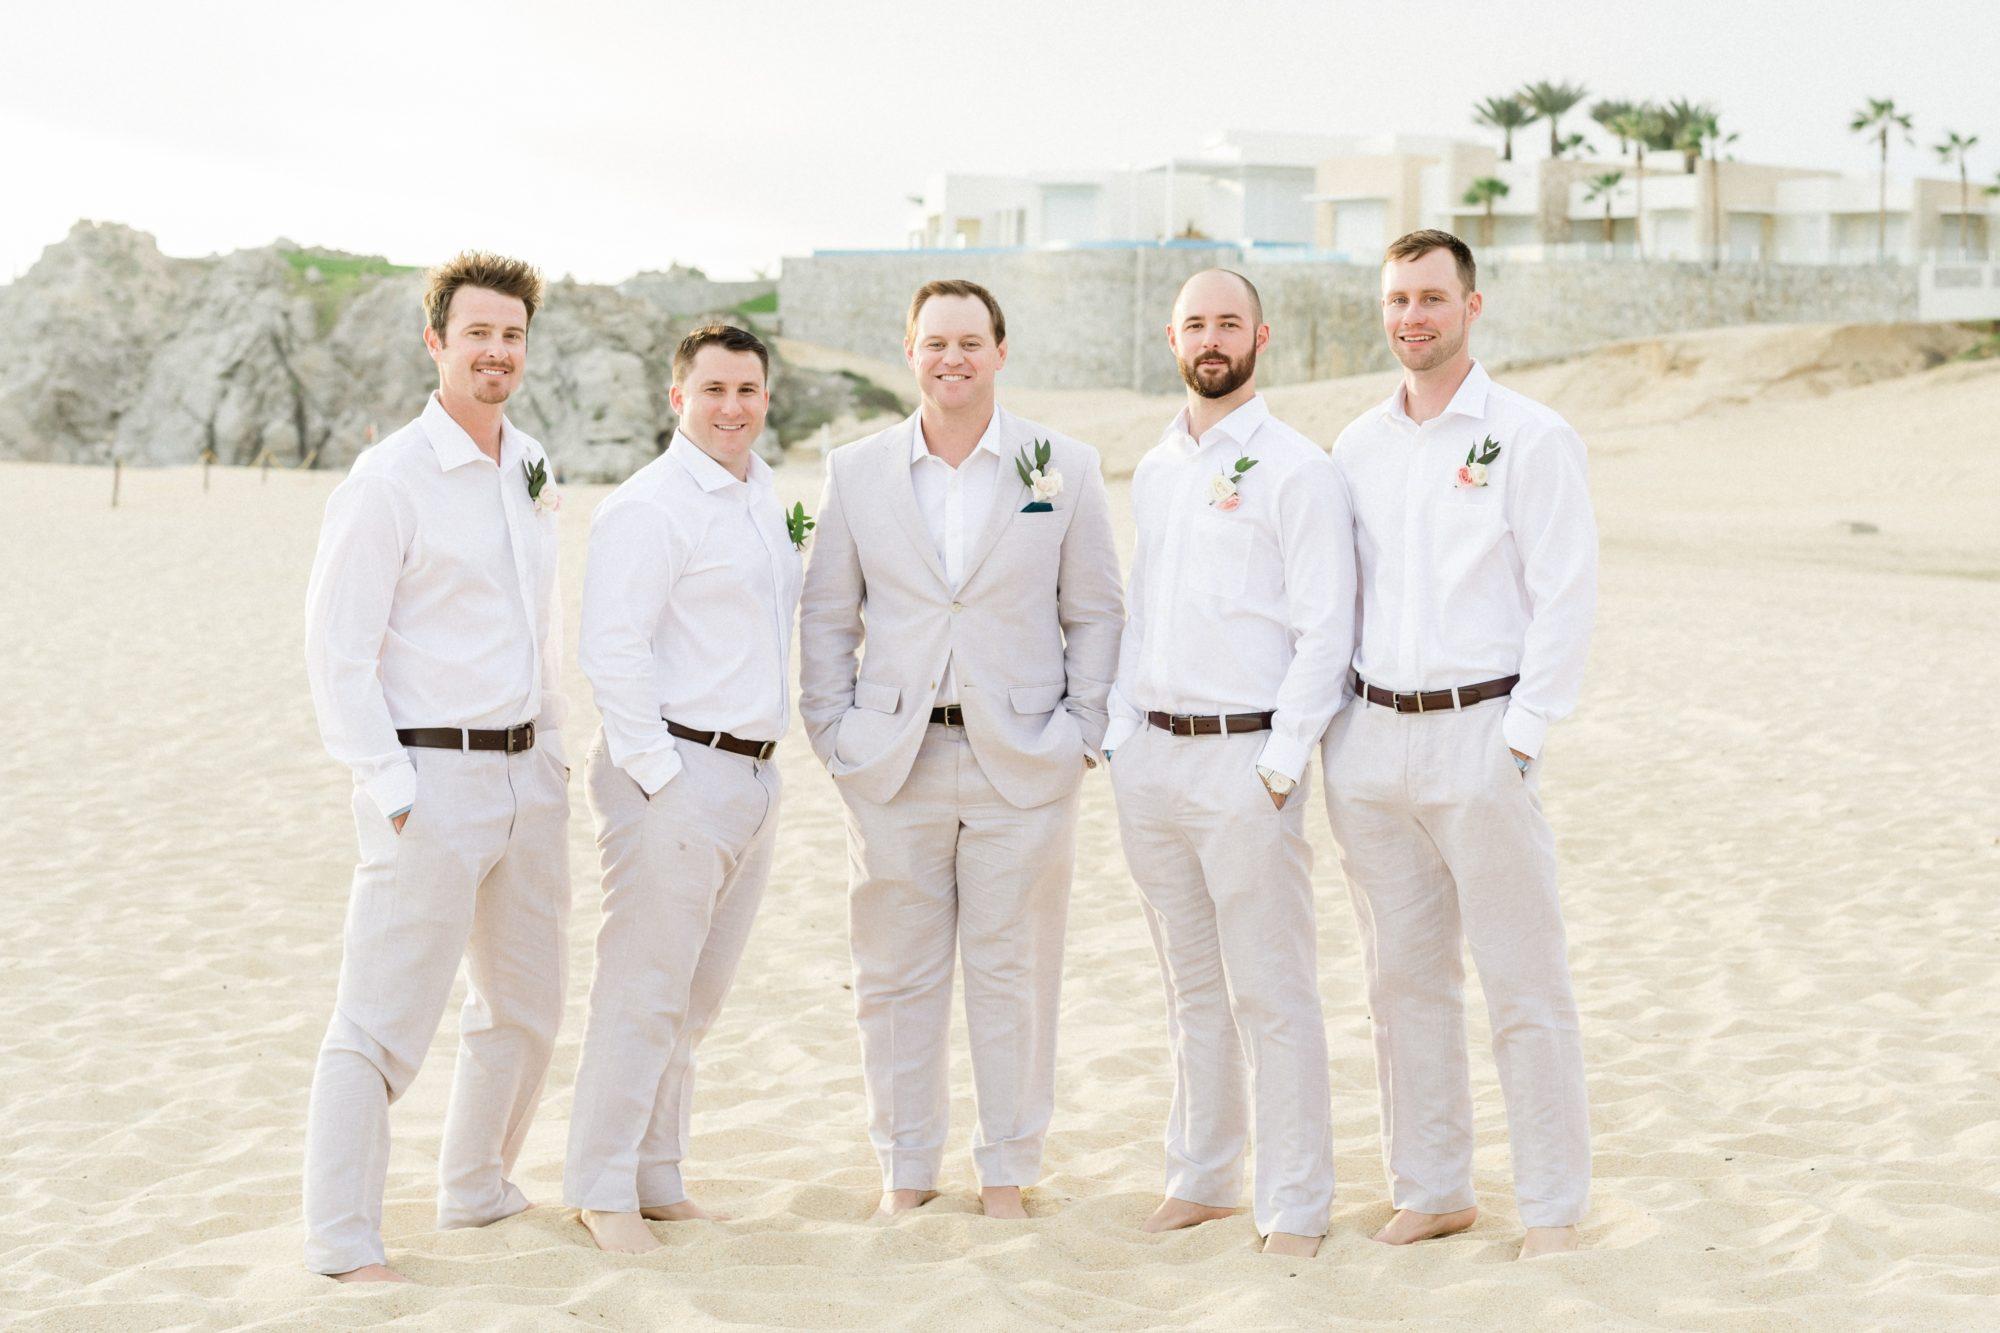 Groom and groomsmen at beachfront wedding